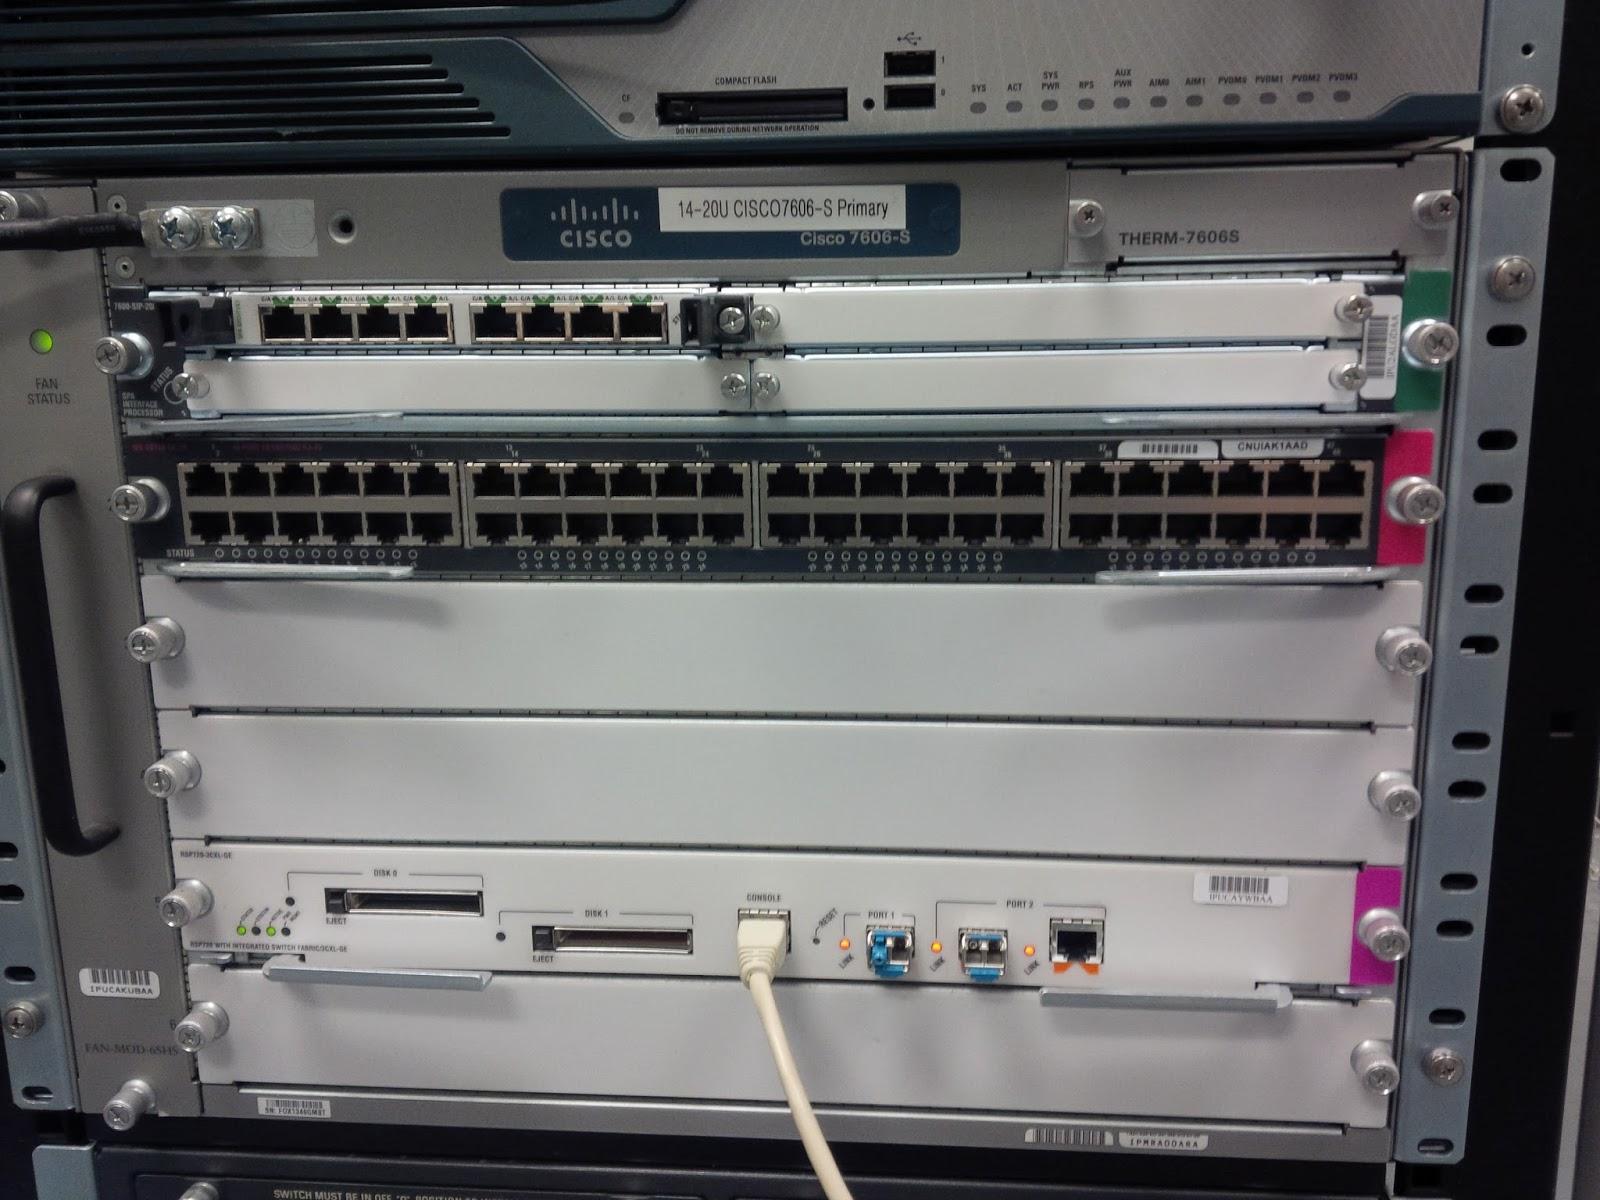 Network Security Memo - Info Security Memo